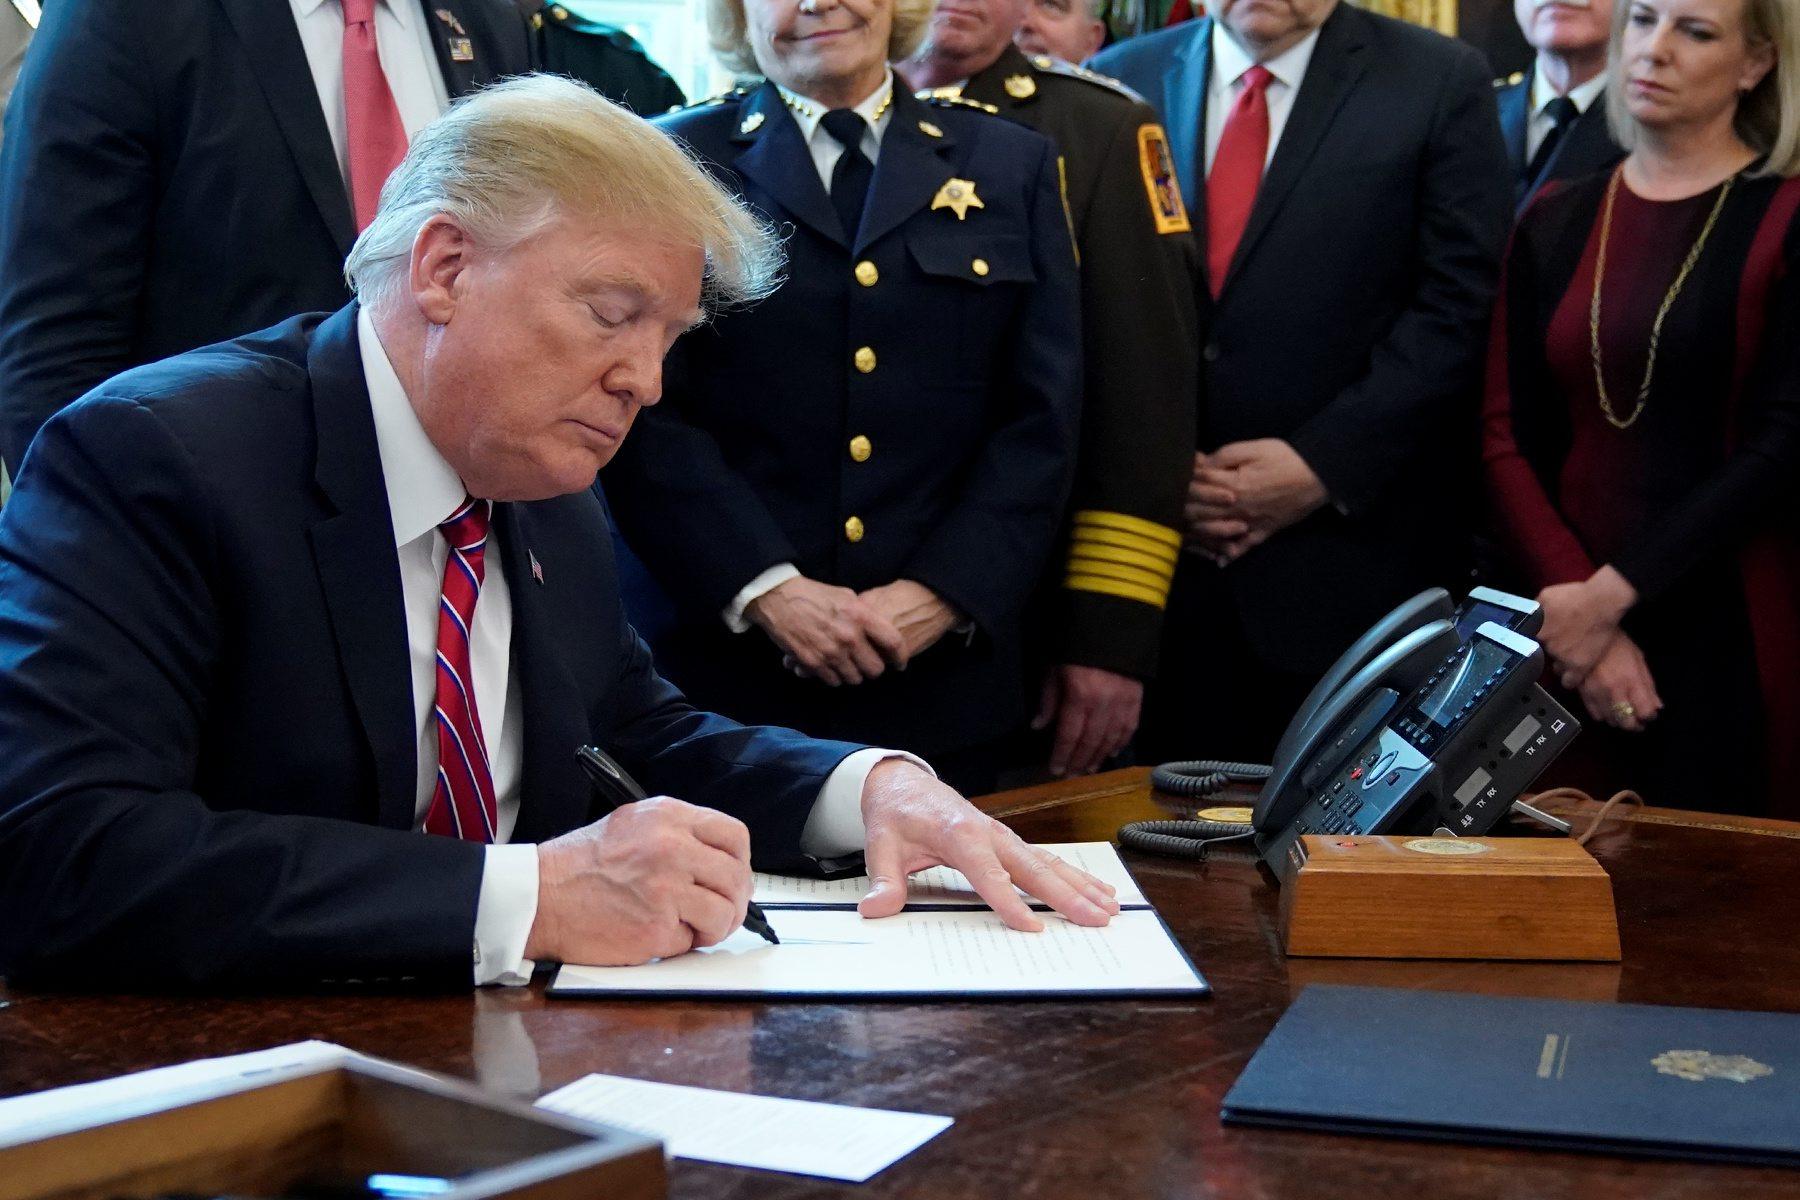 2019-03-15T212956Z_1245233281_RC1F22CC8AA0_RTRMADP_3_USA-TRUMP-CONGRESS-EMERGENCY